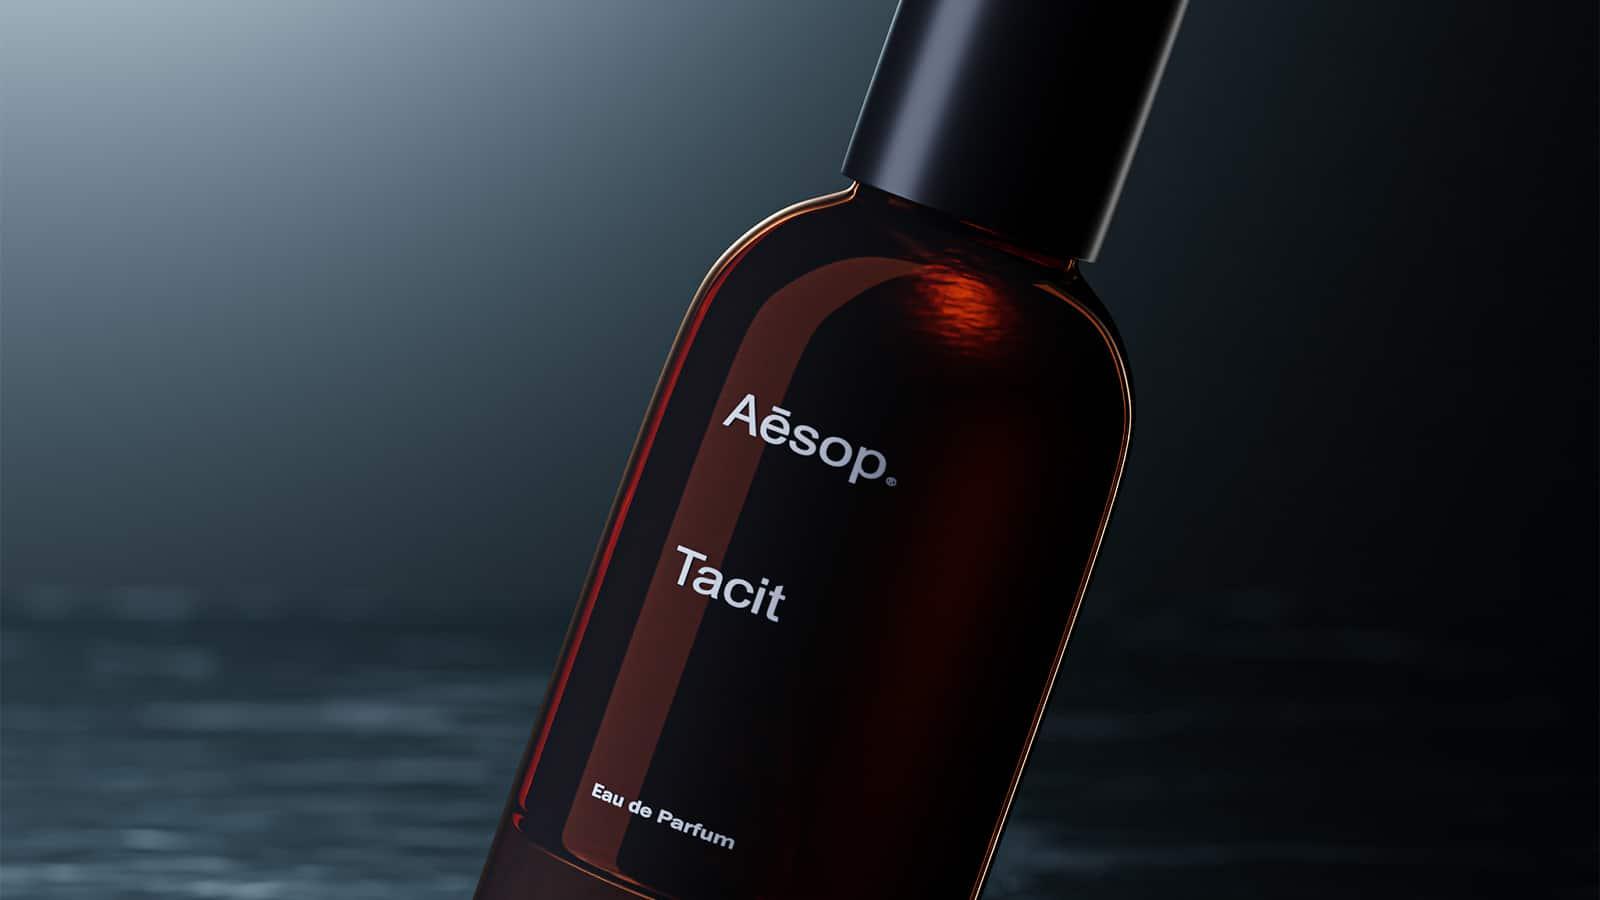 Produkt-Rendering: Parfümflasche